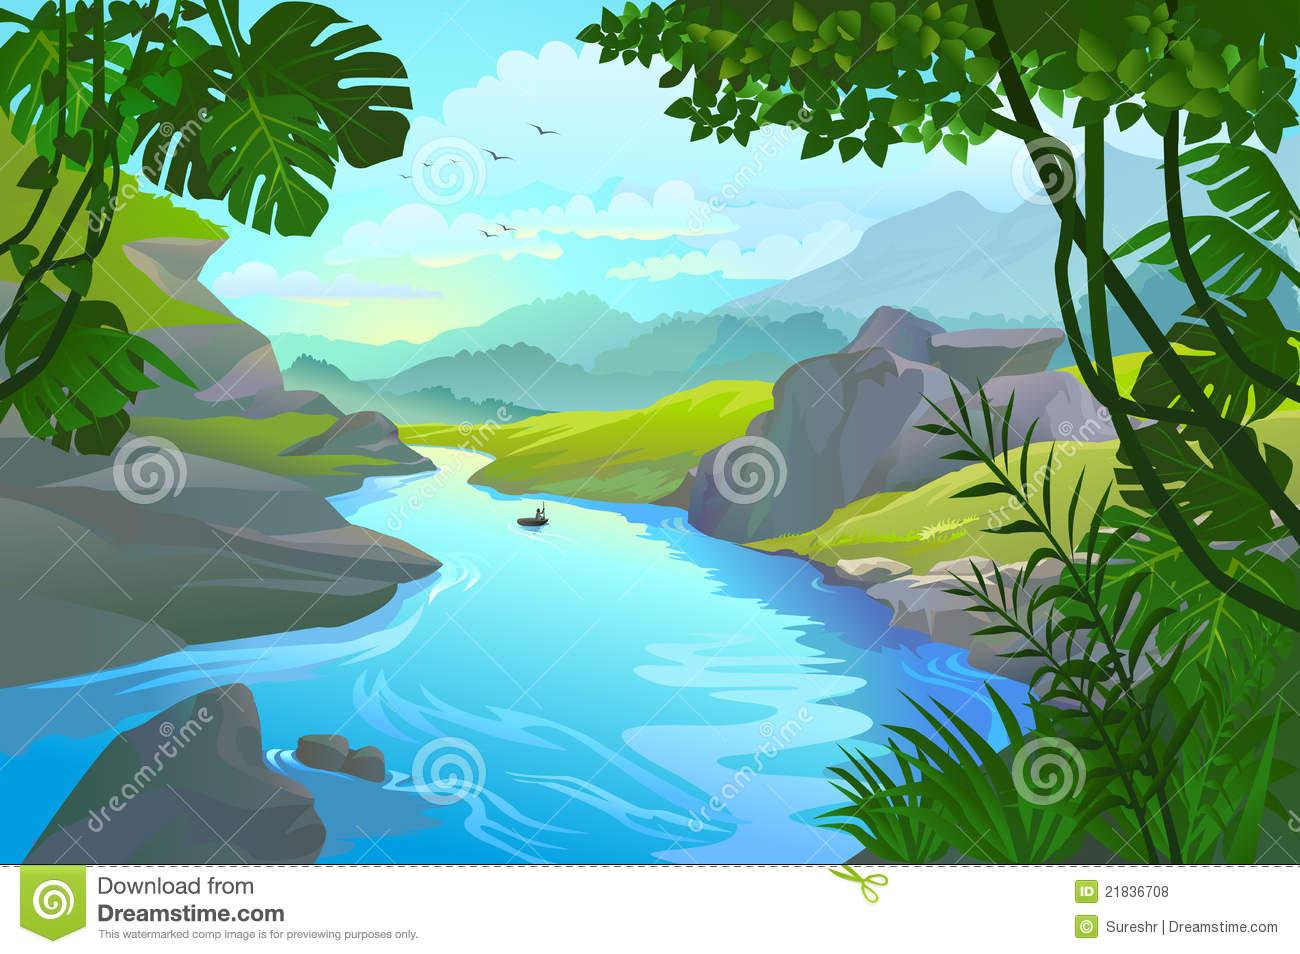 Small river clipart svg download River\'s Edge: River Clipart Boat By A Mountain River svg download